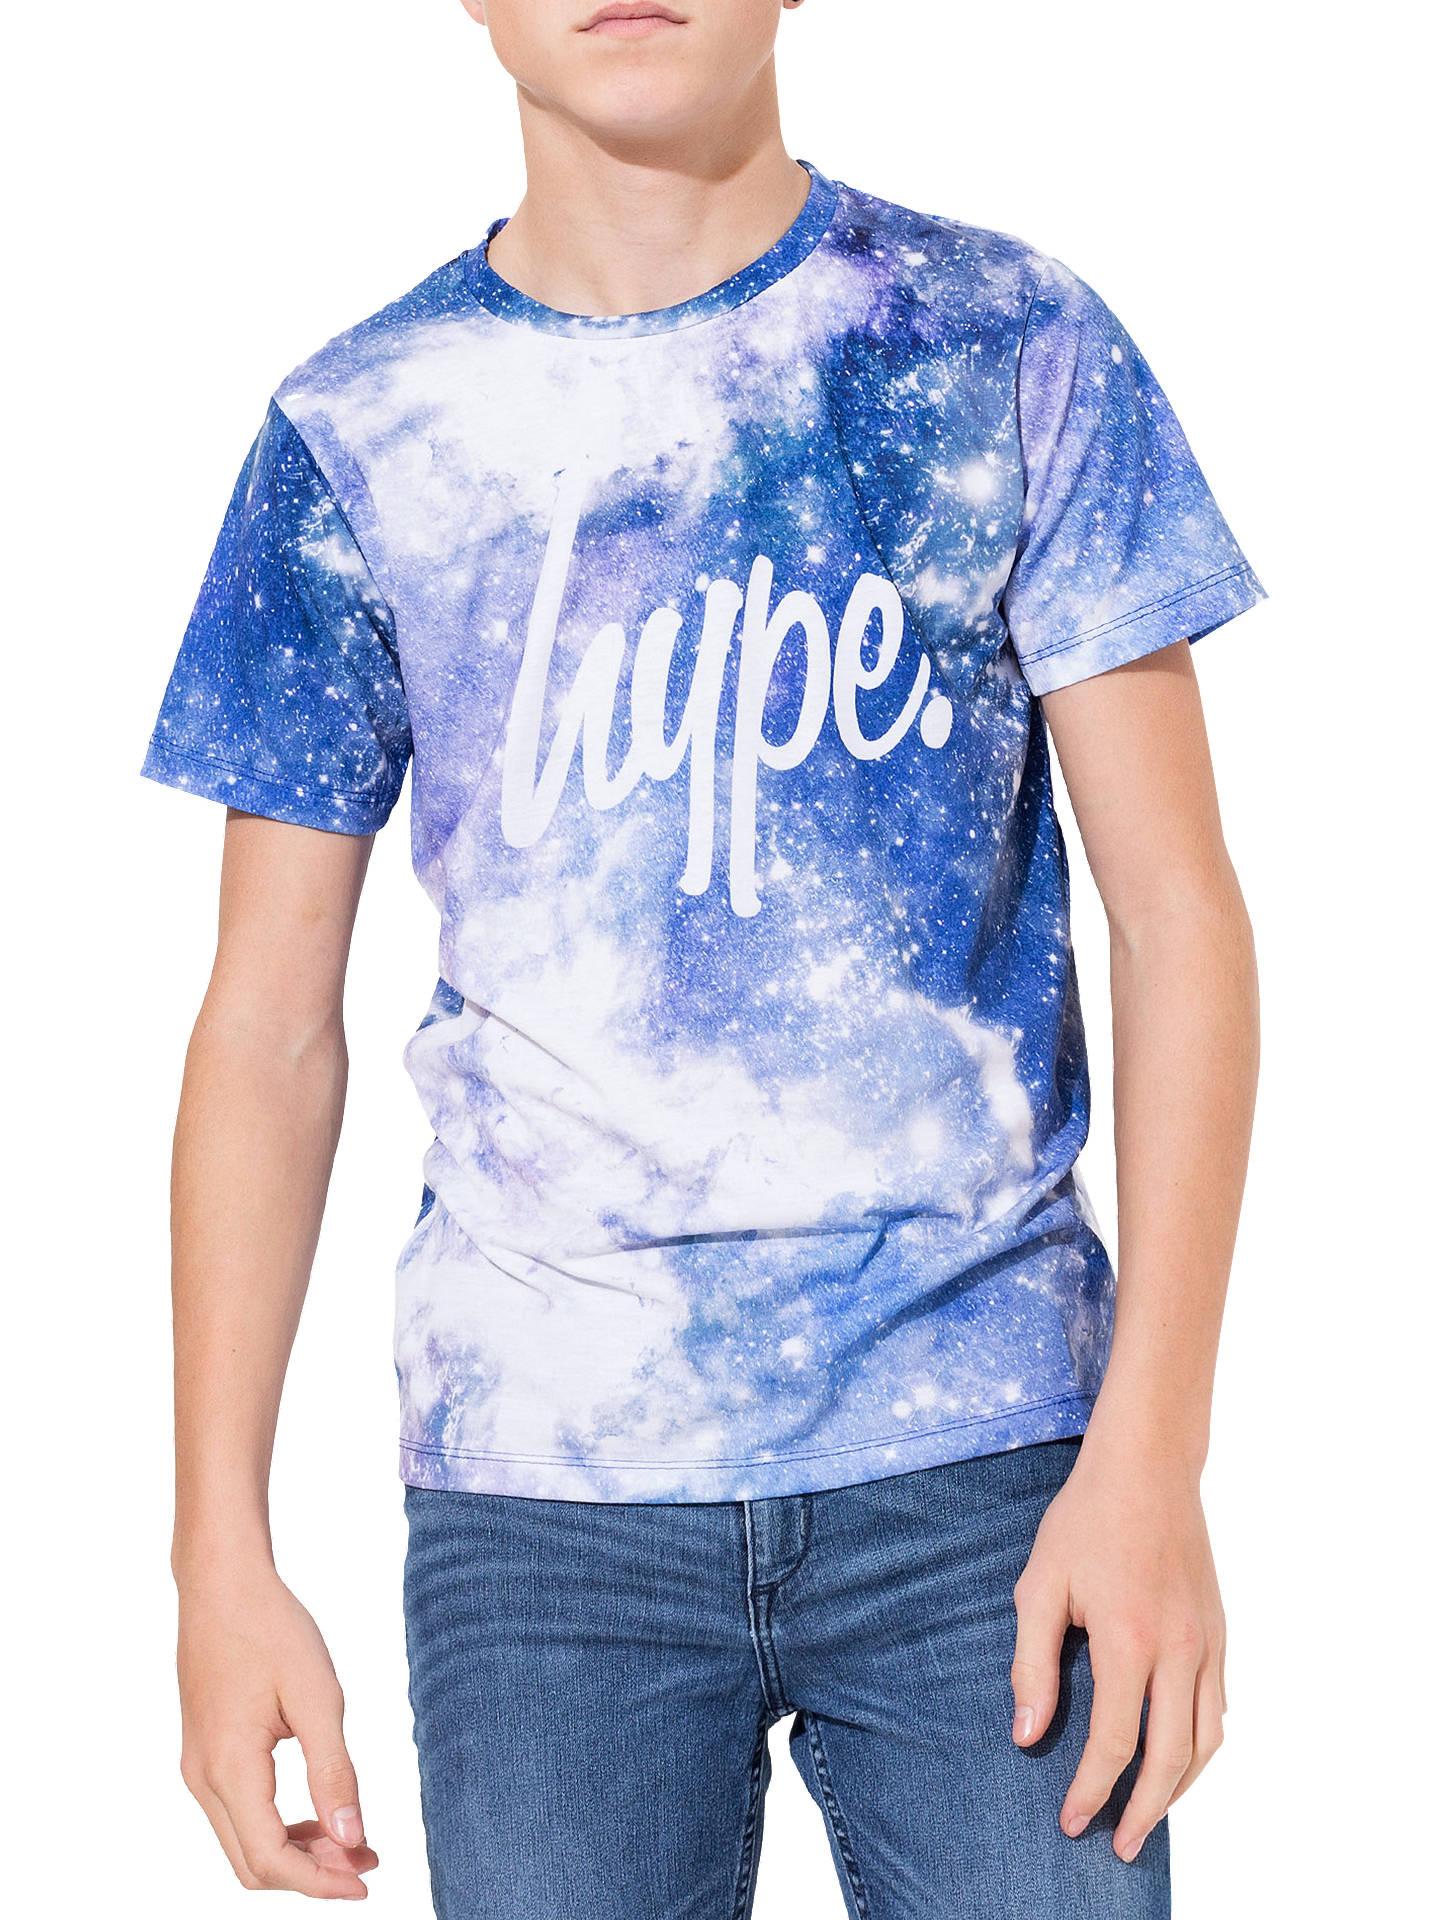 45ecbf15 Hype Boys' Space Print T-Shirt, Navy at John Lewis & Partners